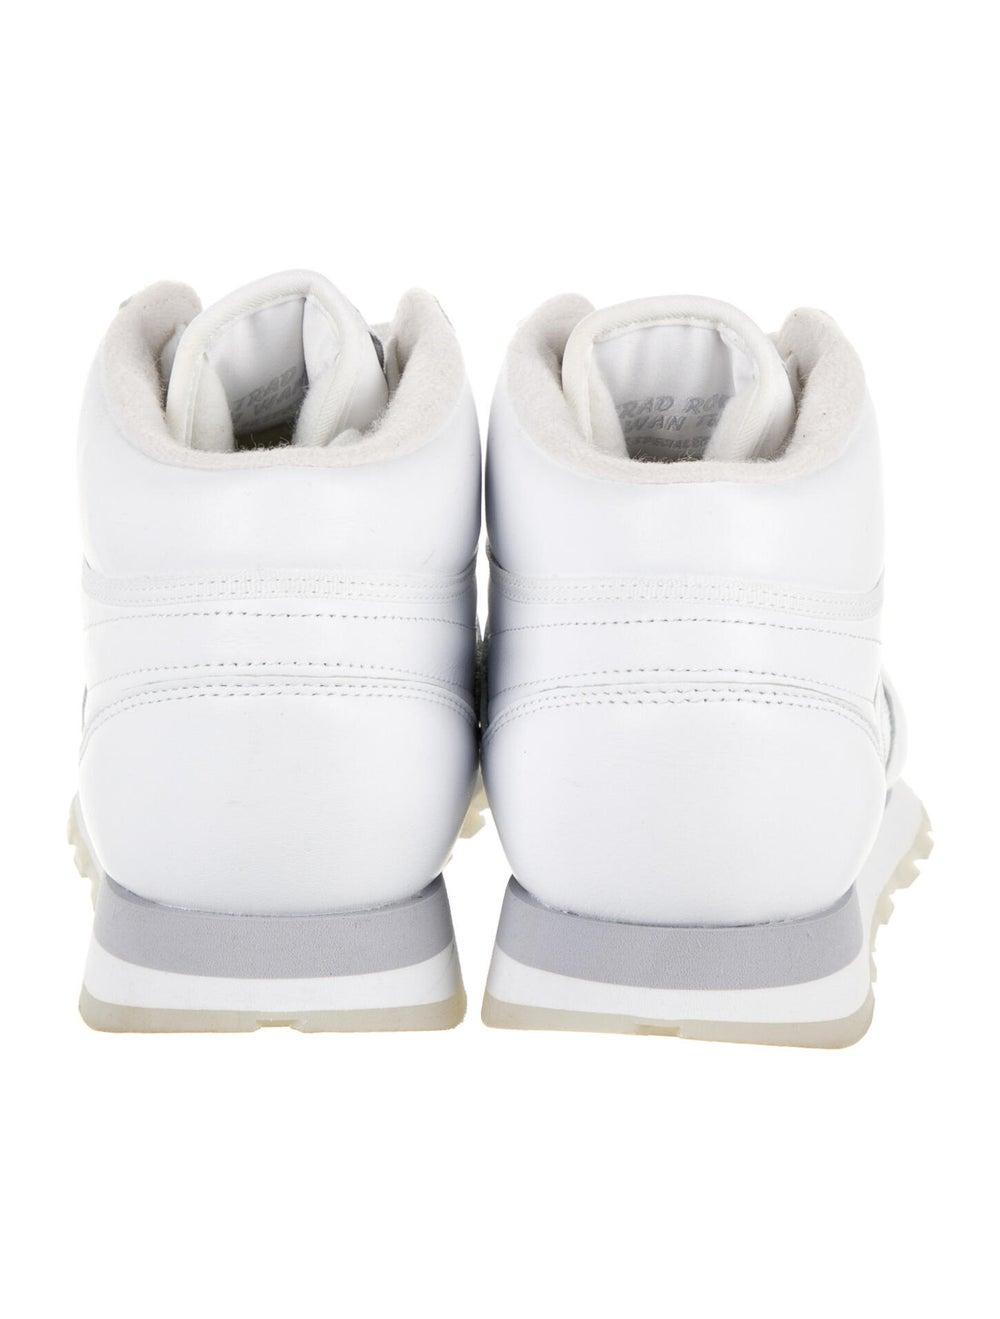 Palace Skateboards x Reebok JK Workout Sneakers S… - image 4